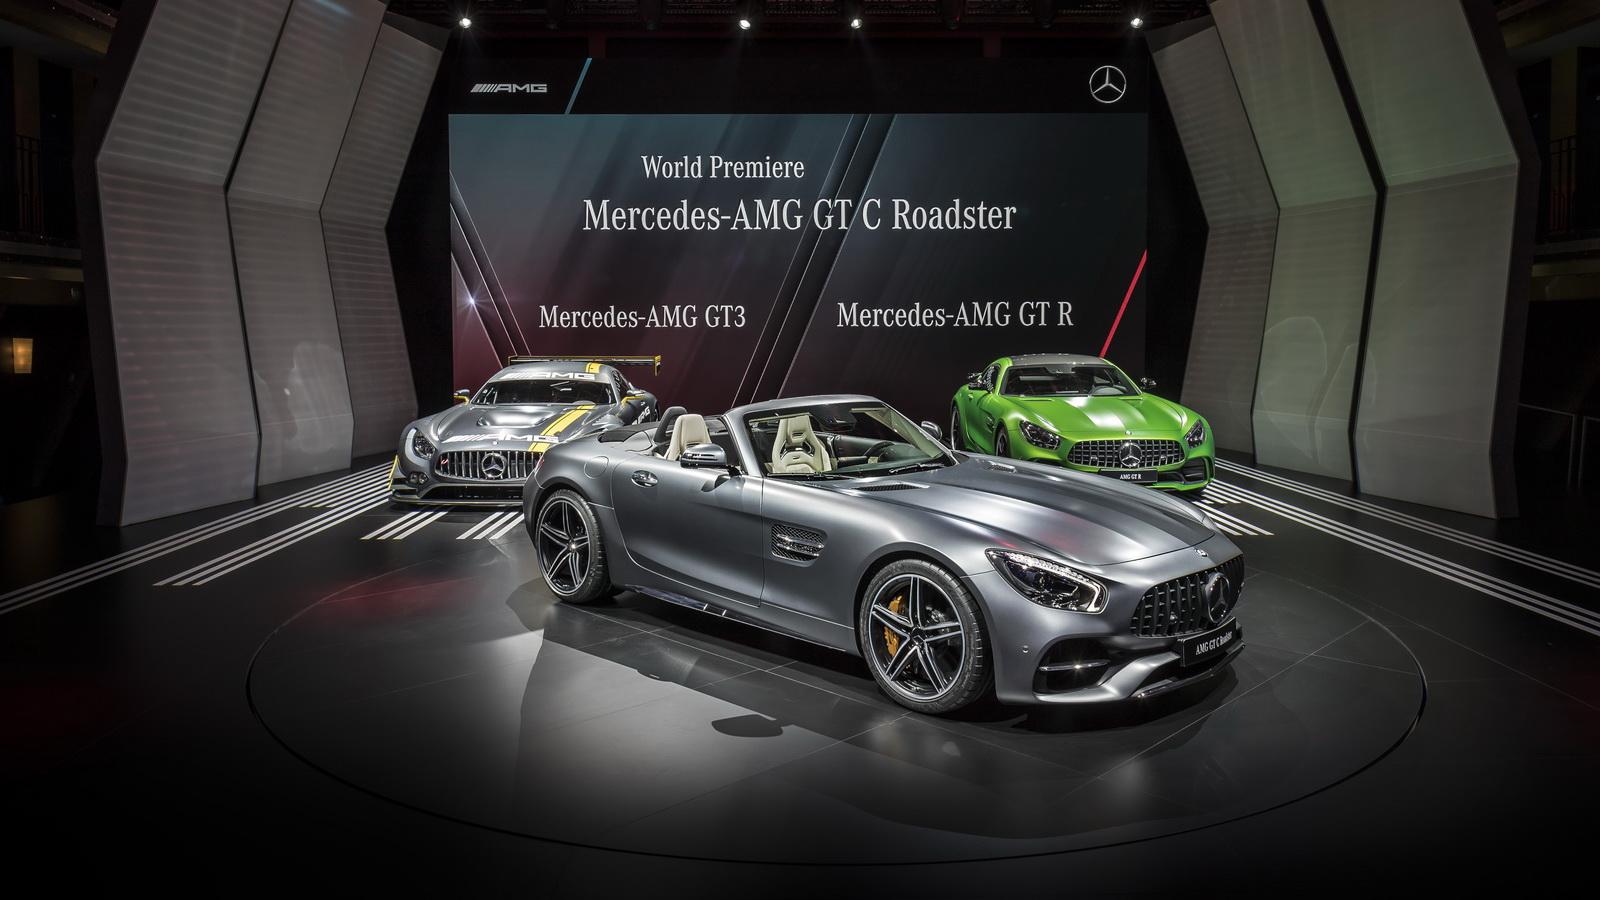 Mercedes-AMG-GTC-Roadster-11